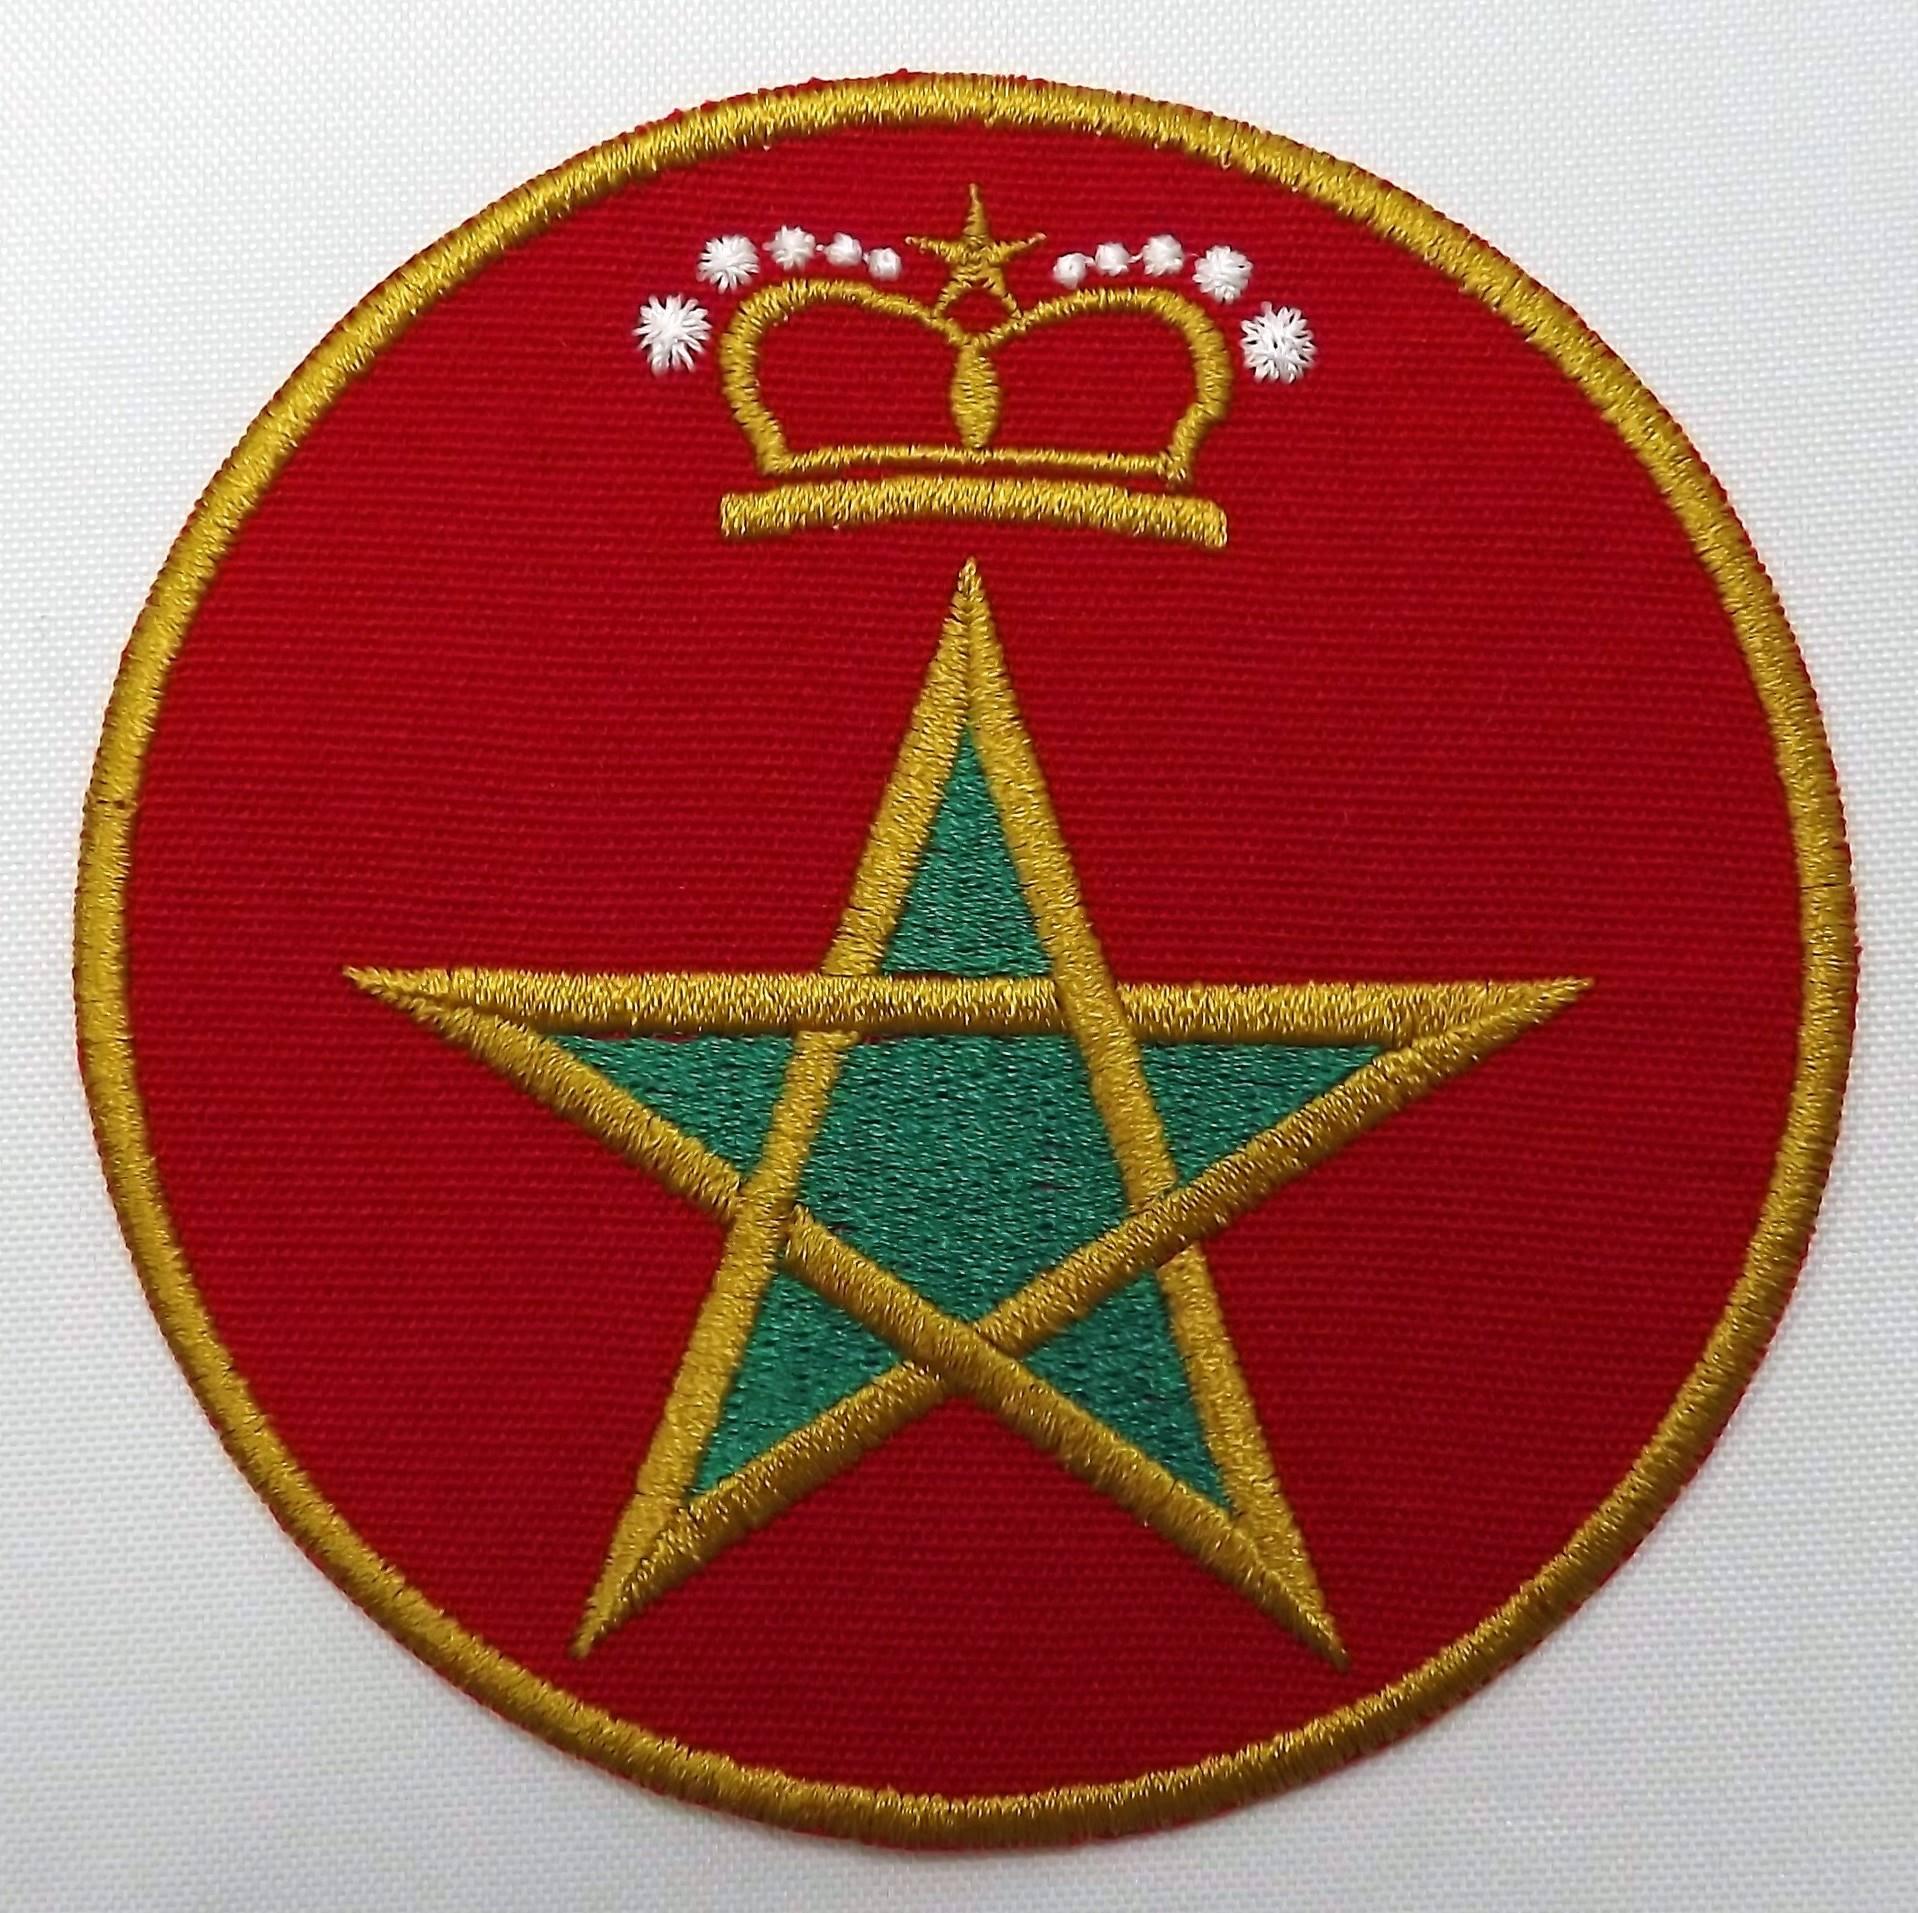 RMAF insignia Swirls Patches / Ecussons,cocardes et Insignes Des FRA - Page 5 151221045222493645